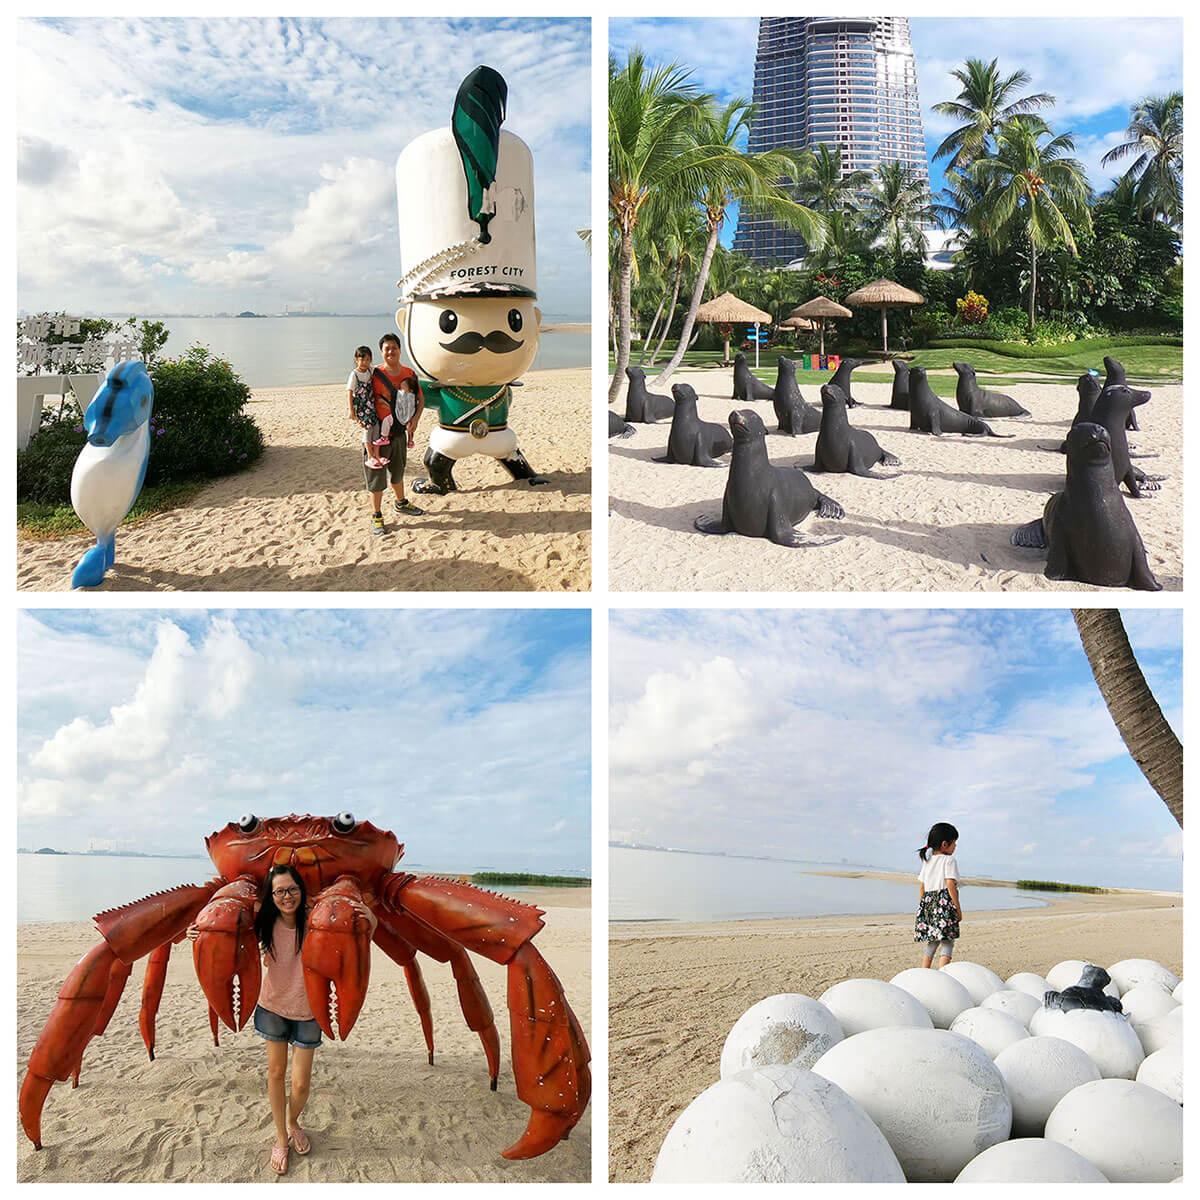 森林城市沙滩 Forest City Johor